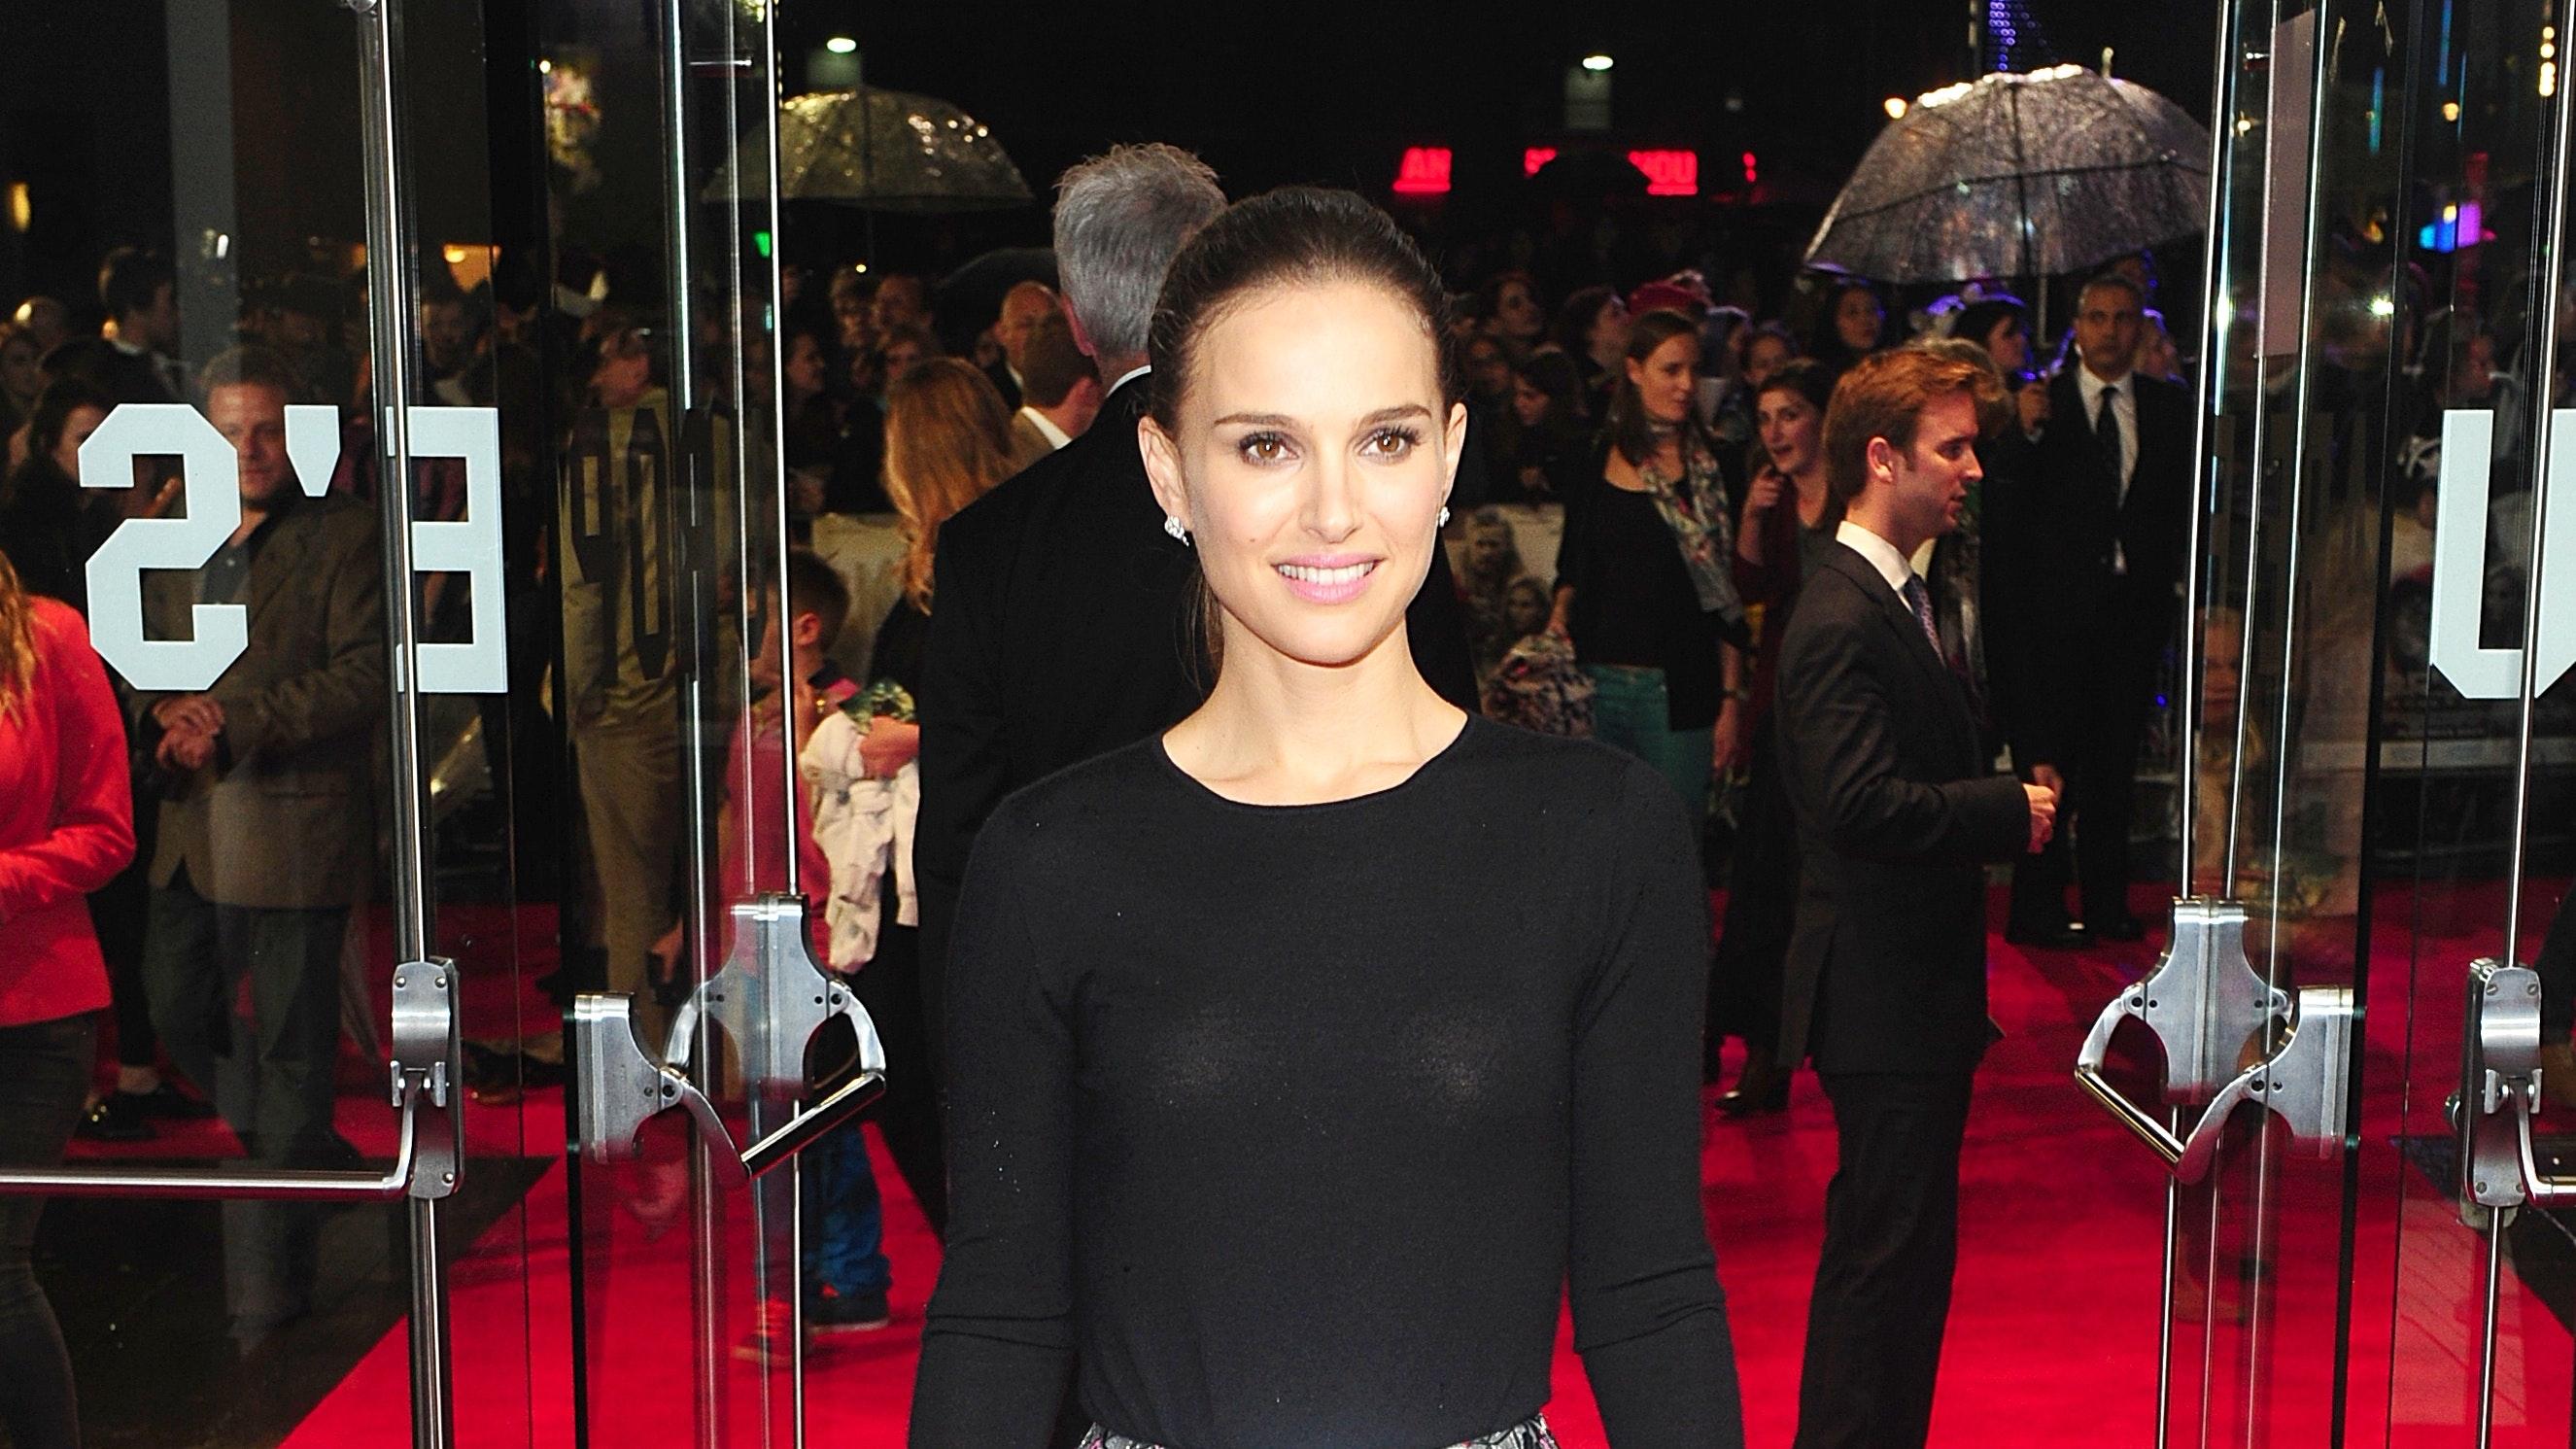 Natalie Portman denies dating Moby, calls him 'creepy'